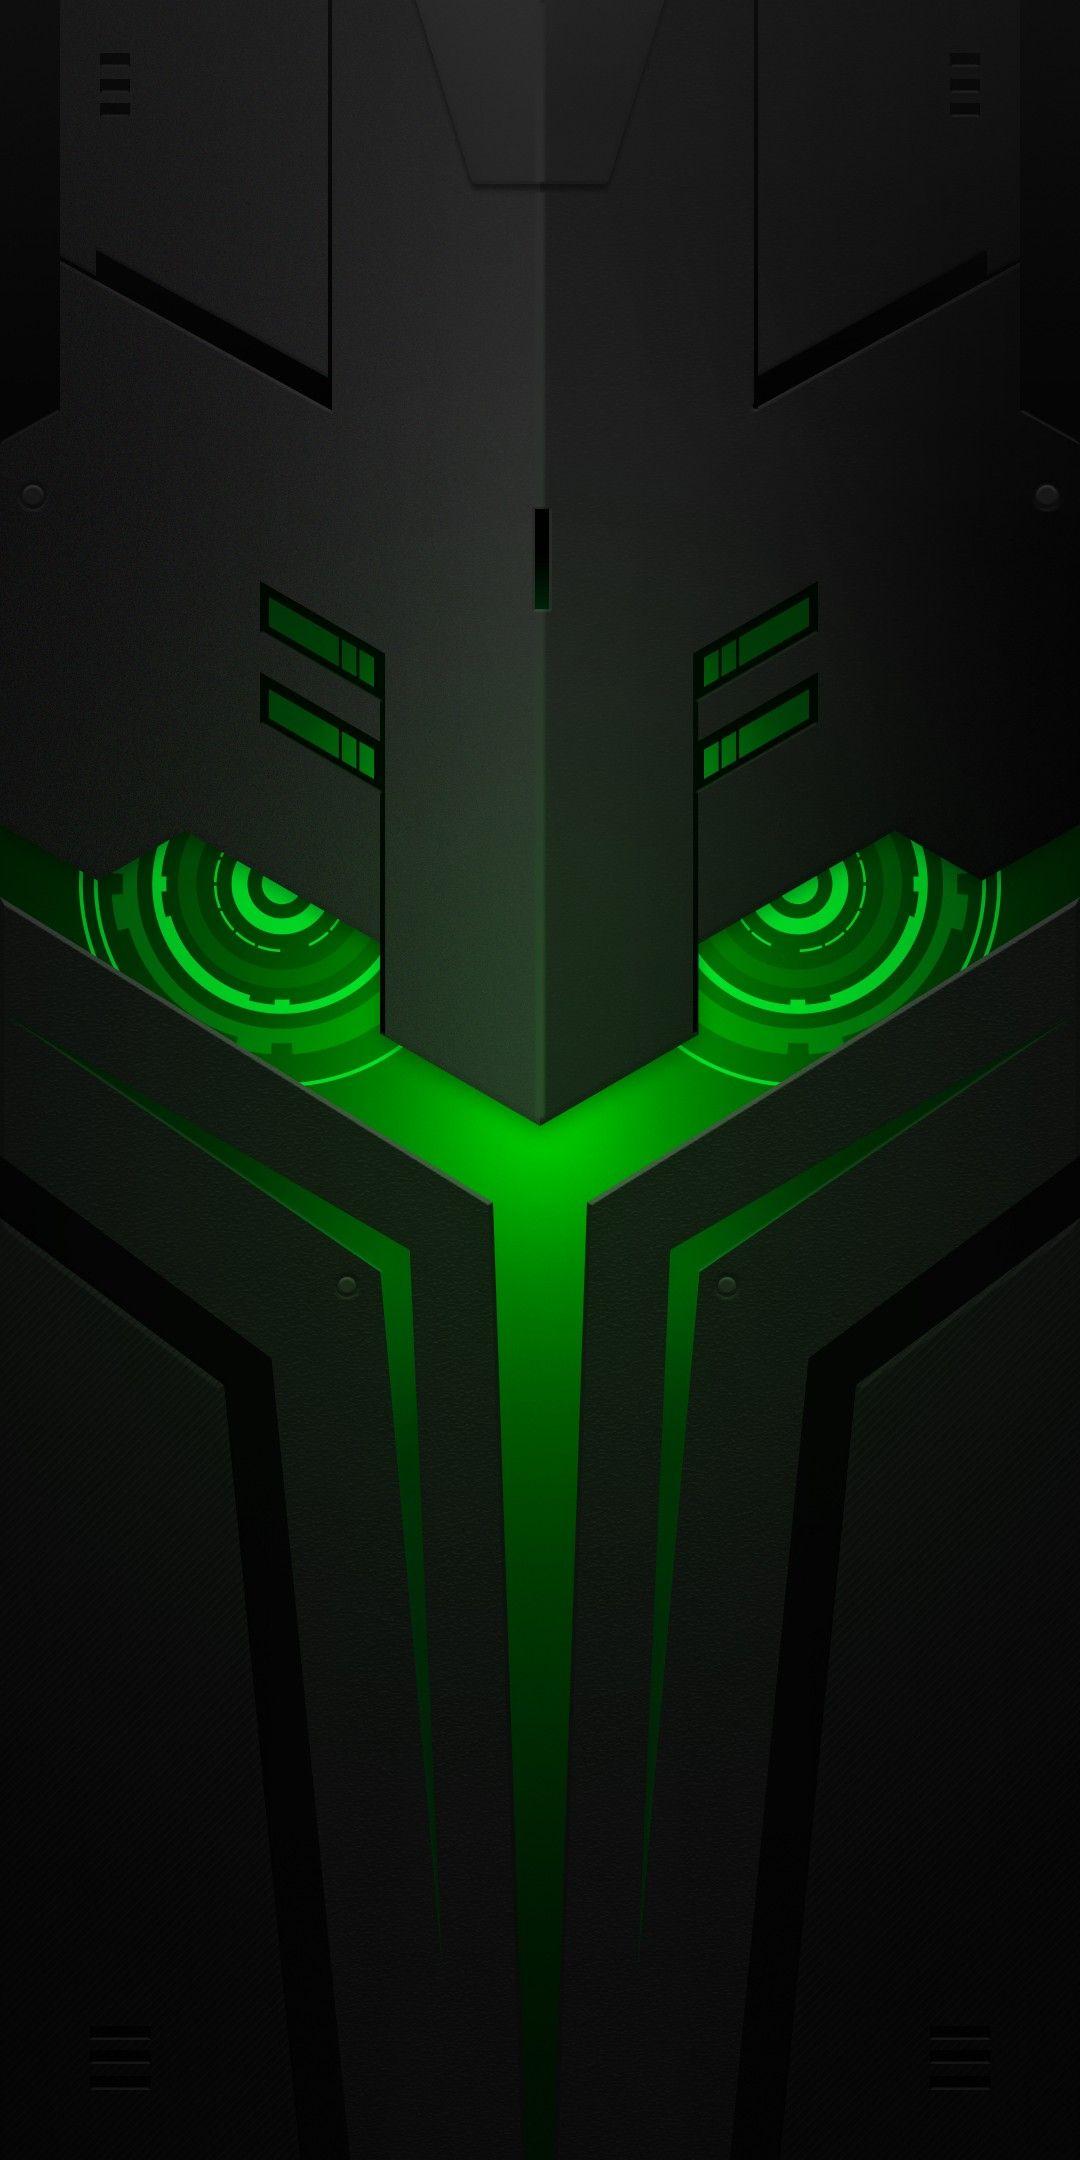 Wallpaper Hitam Hijau Hd : wallpaper, hitam, hijau, Xiaomi, Black, Shark, Wallpaper, Android,, Ponsel, Hitam,, Iphone, Hitam